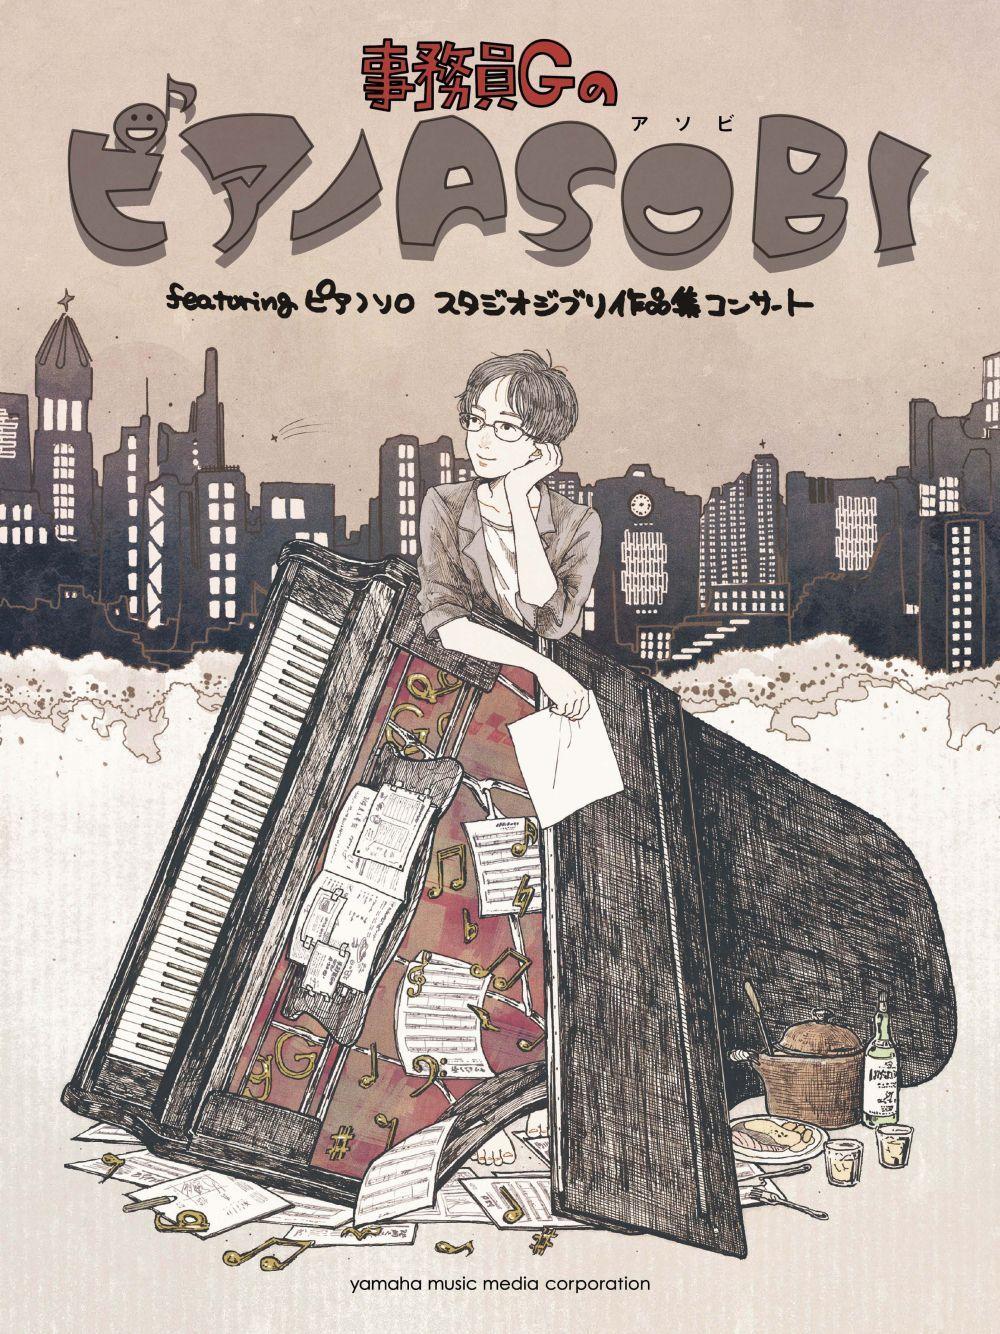 DVD of Studio Ghibli Concert by Jimuin G: Piano: Instrumental Album